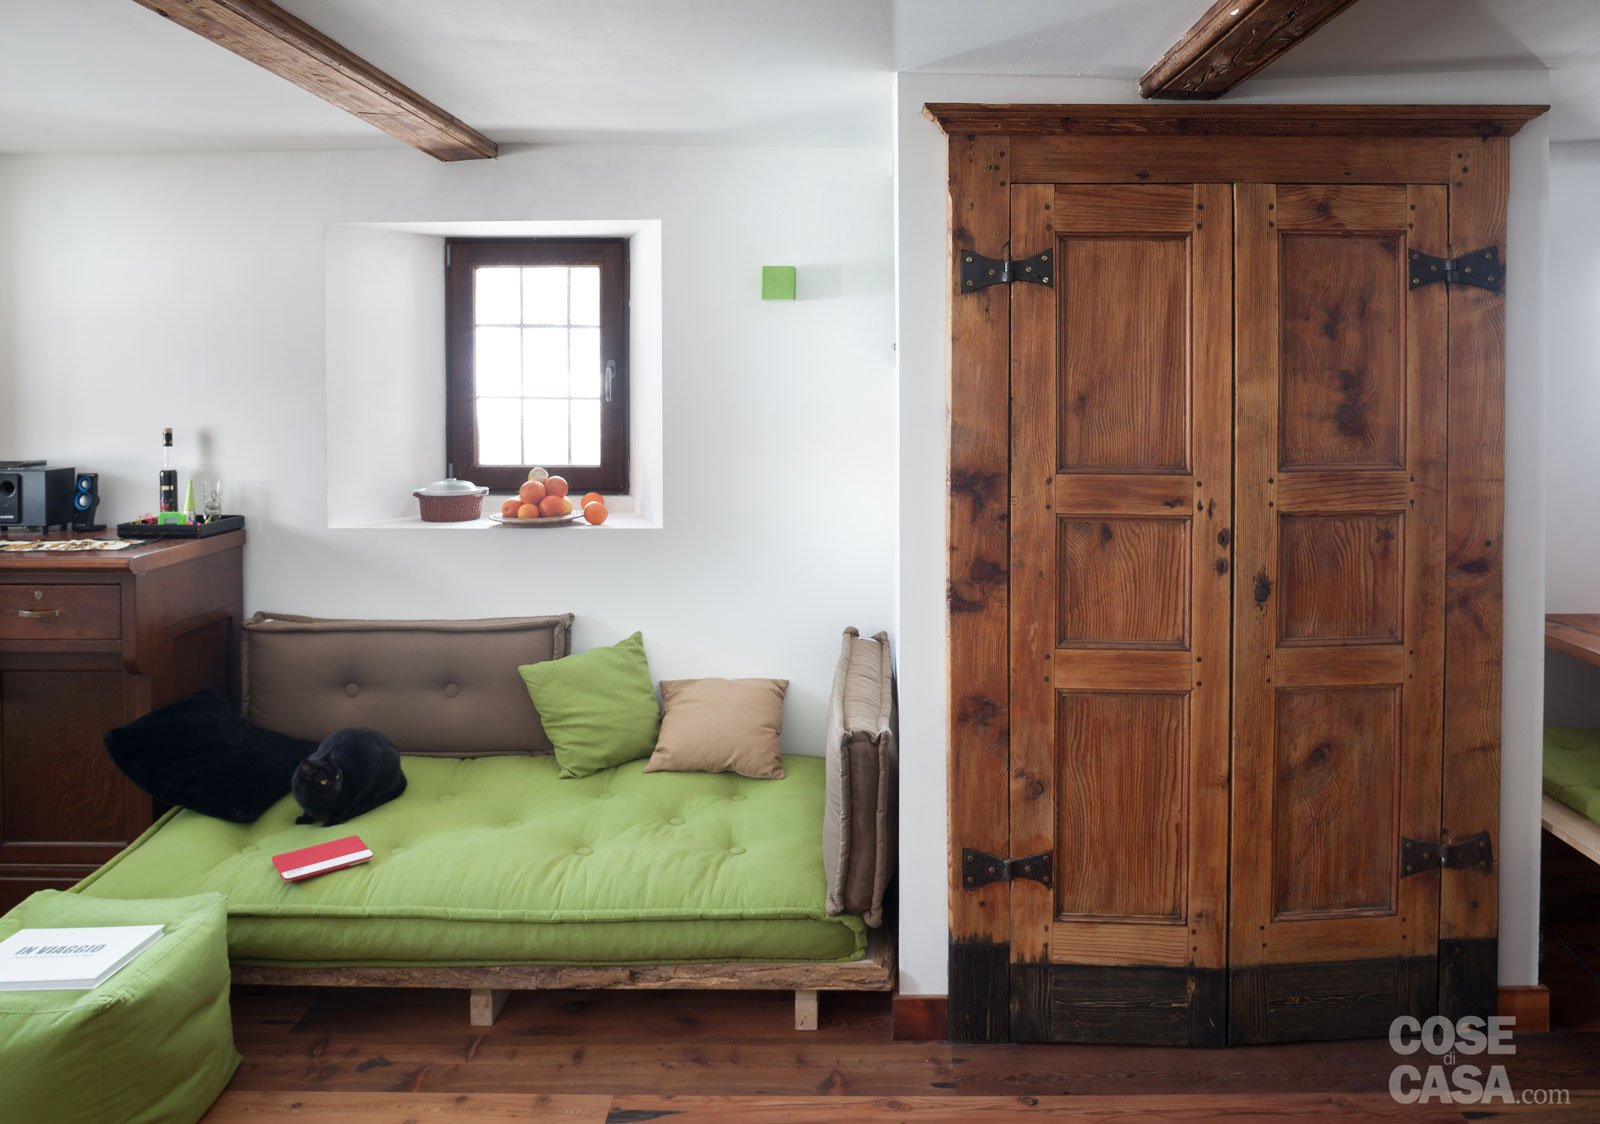 30 30 mq restauro di una tipica casa di montagna cose di casa - Casa ikea 50 mq ...